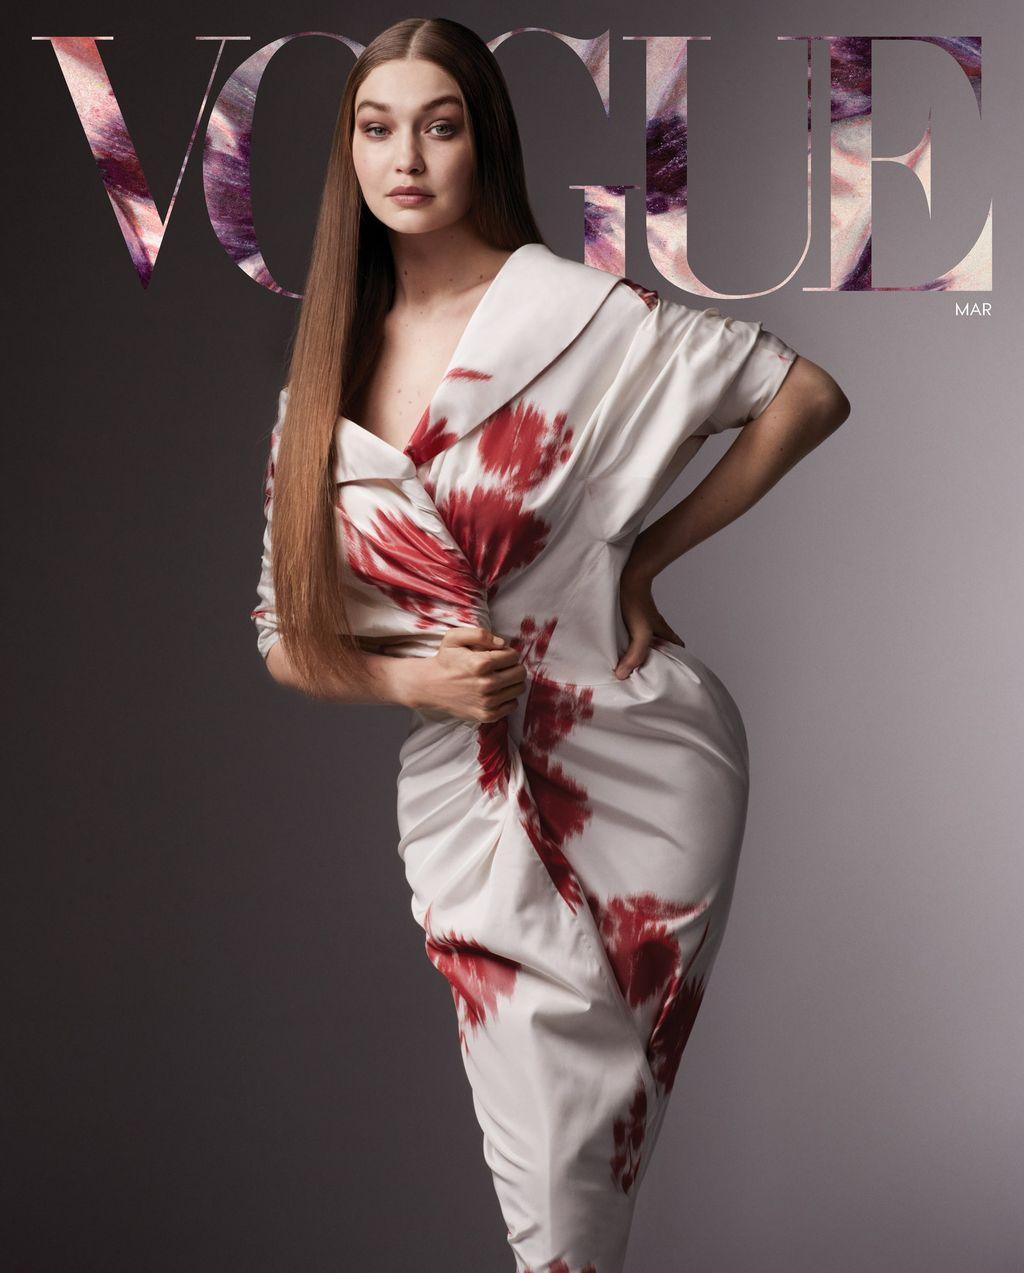 Gigi Hadid Vogue Maret 2021